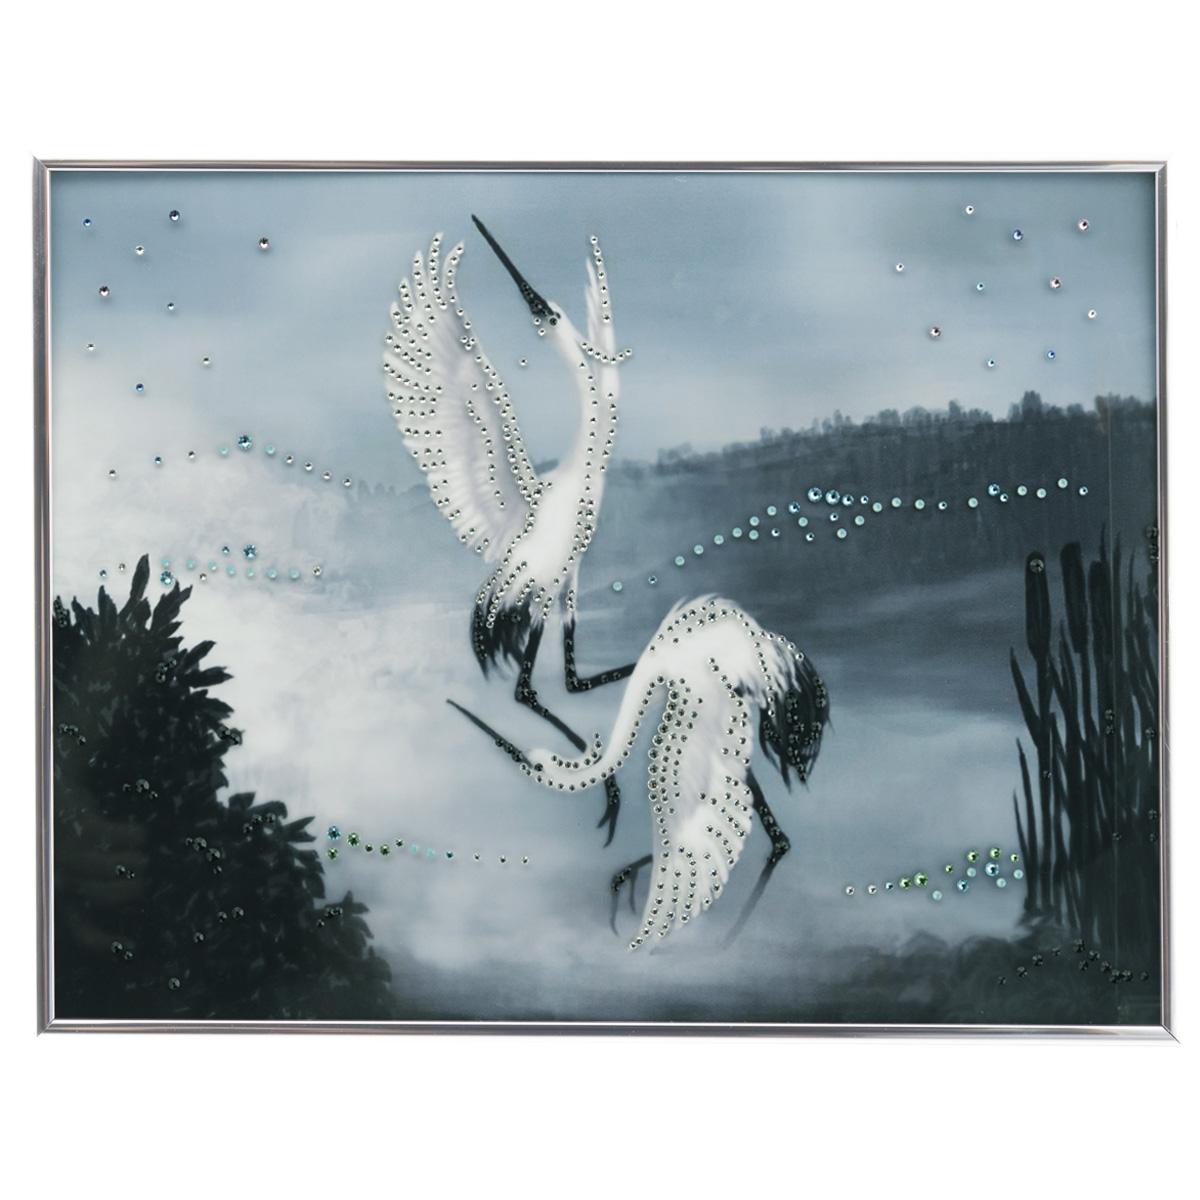 Картина с кристаллами Swarovski Танец журавлей, 40 х 30 см картины в квартиру картина etude 2 102х130 см